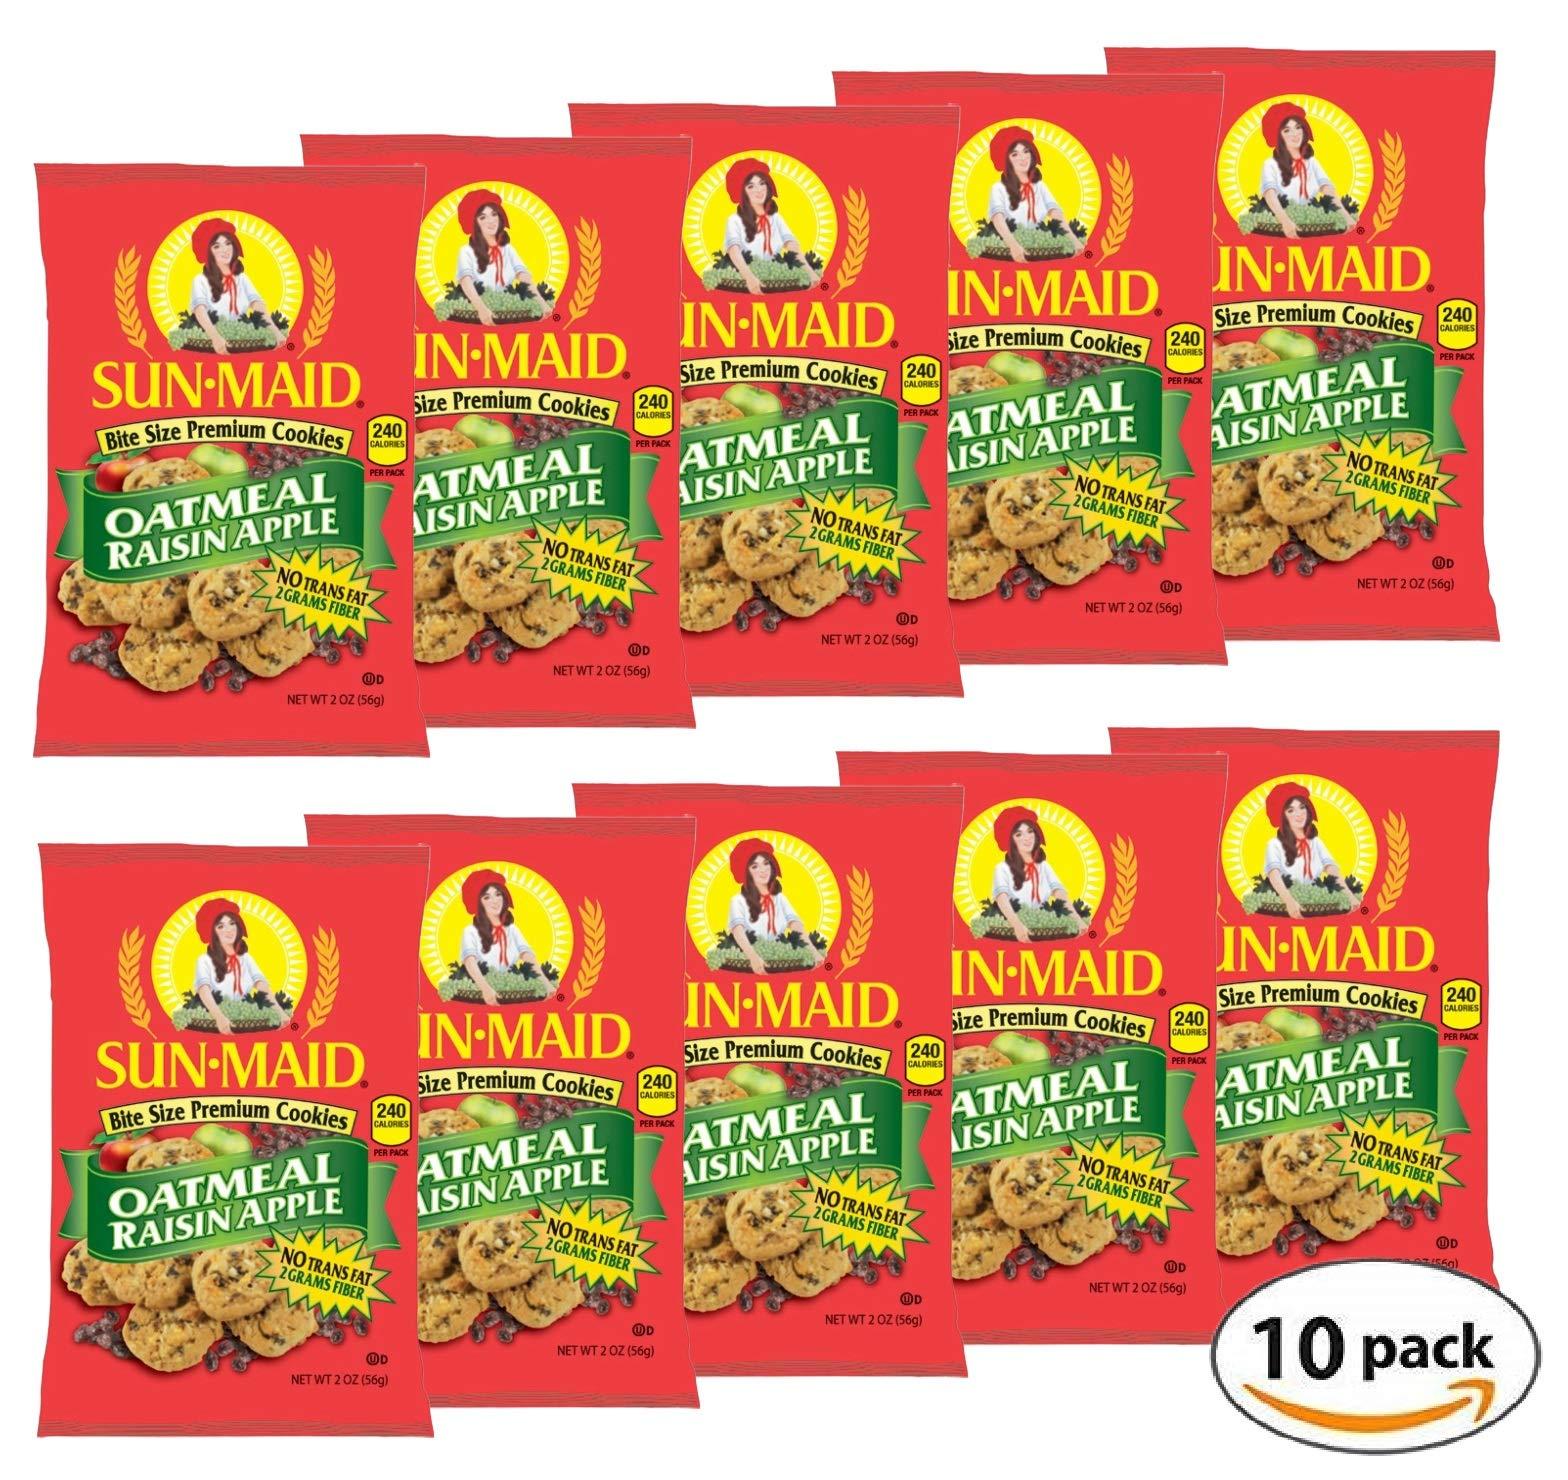 Sun Maid Oatmeal Raisin Apple Bite Size Premium Cookies (Pack of 10). 2 Oz Per Pack (20 Oz Total) by Sun Maid